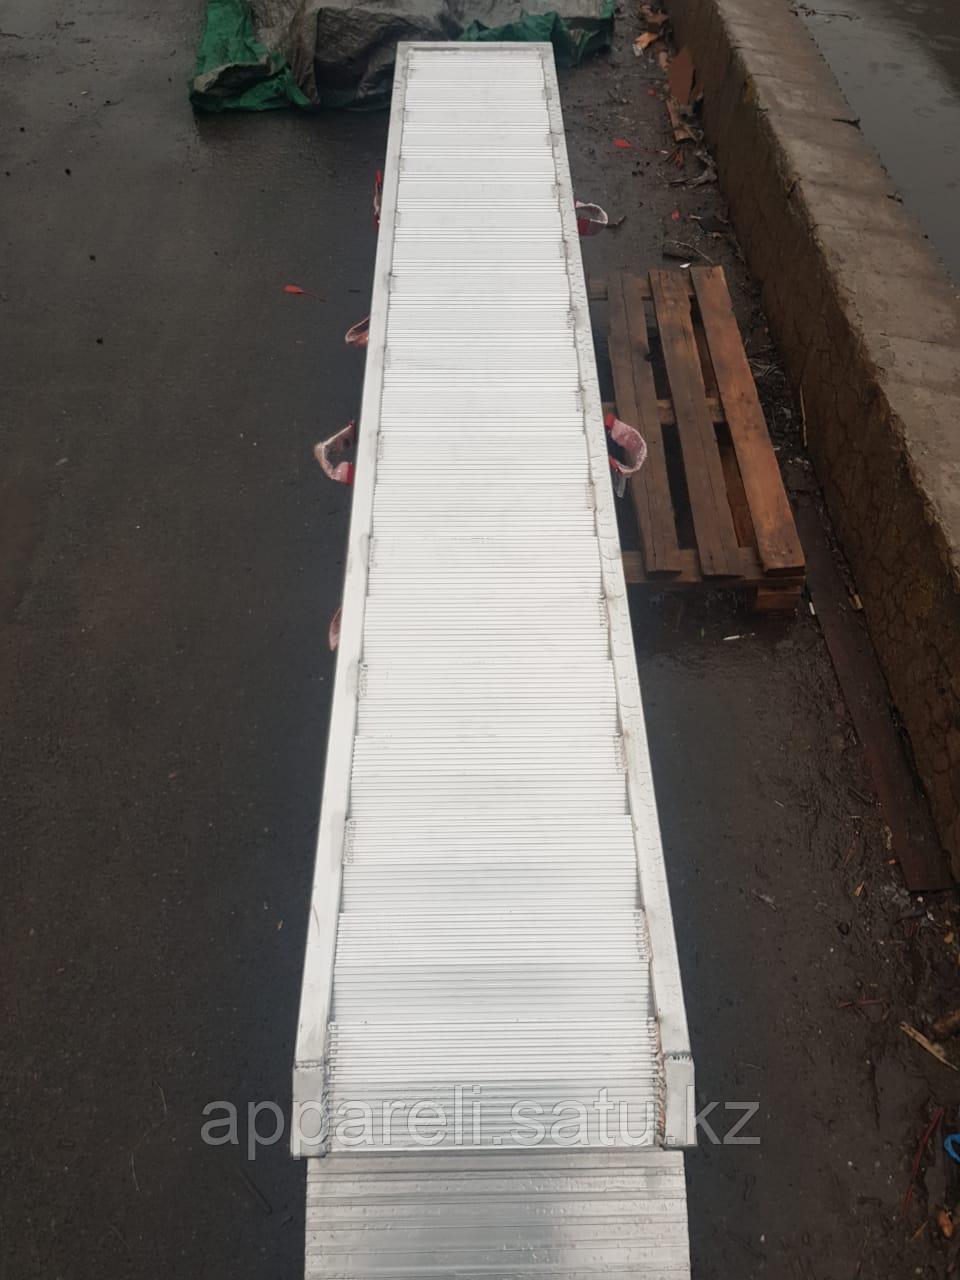 Алюминиевые аппарели от производителя 3,5 метра, 8,5 тонн